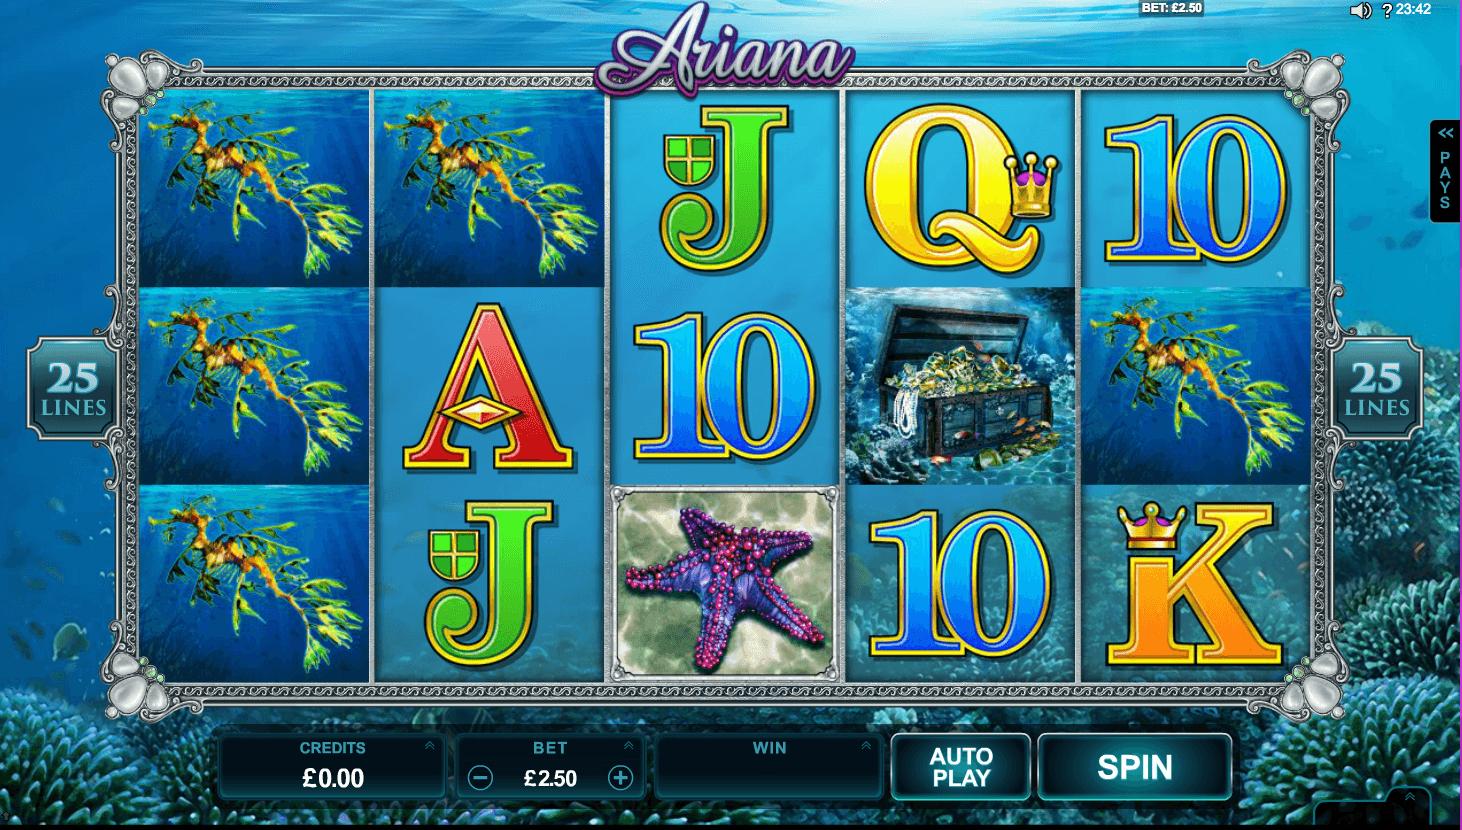 Ariana Casino Slots